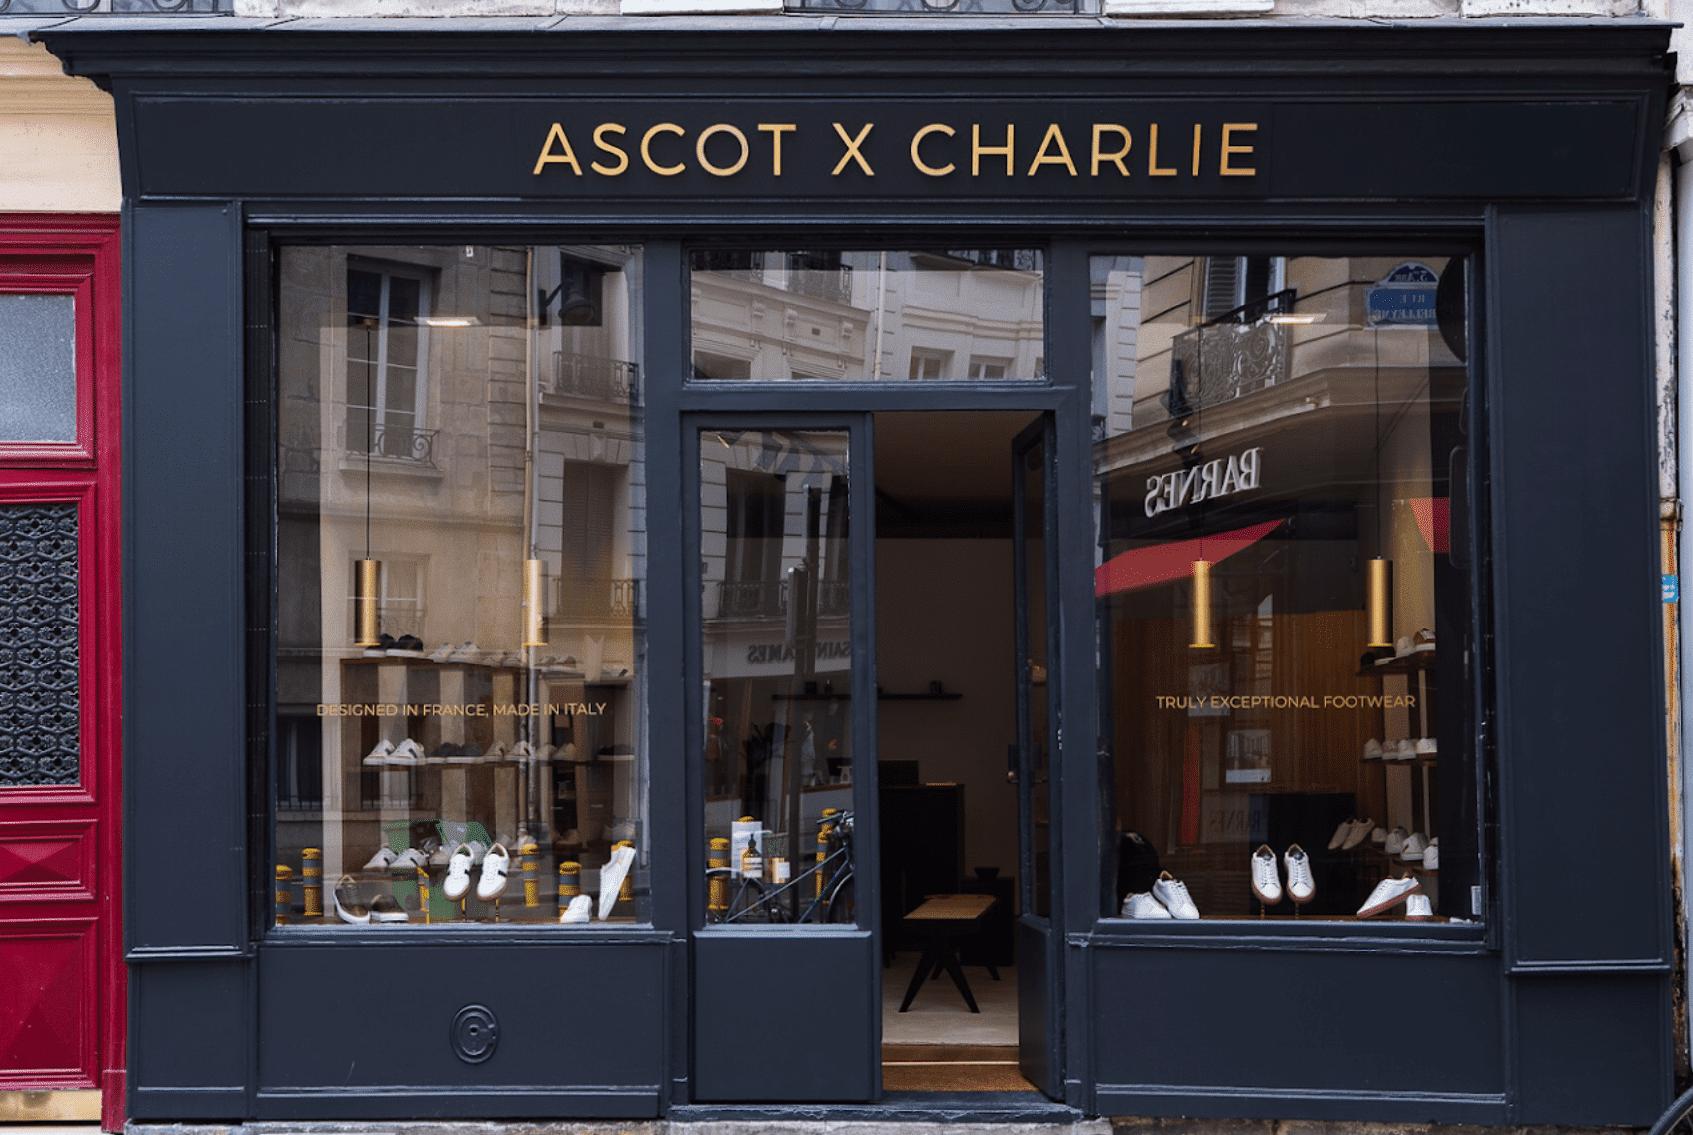 Ascot & Charlie